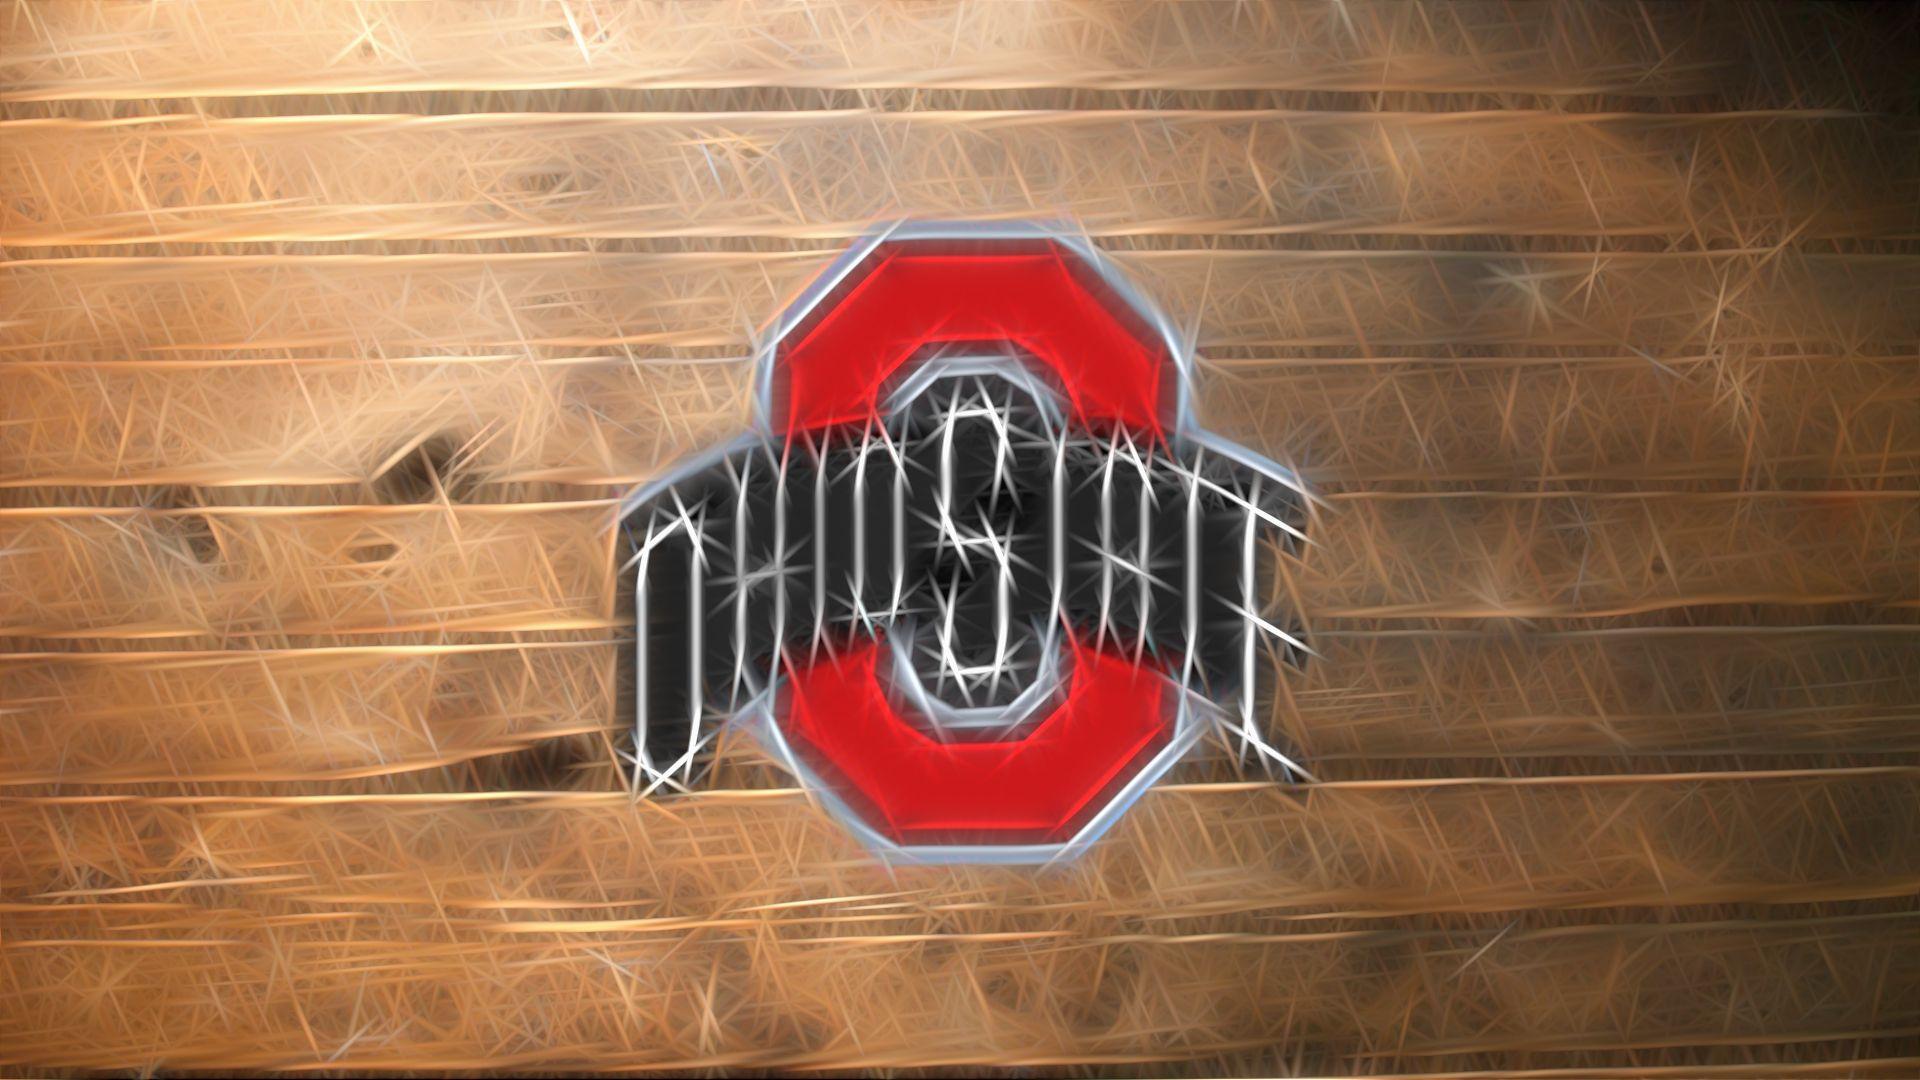 OSU Wallpaper 207 Ohio state wallpaper, Ohio state, Ohio